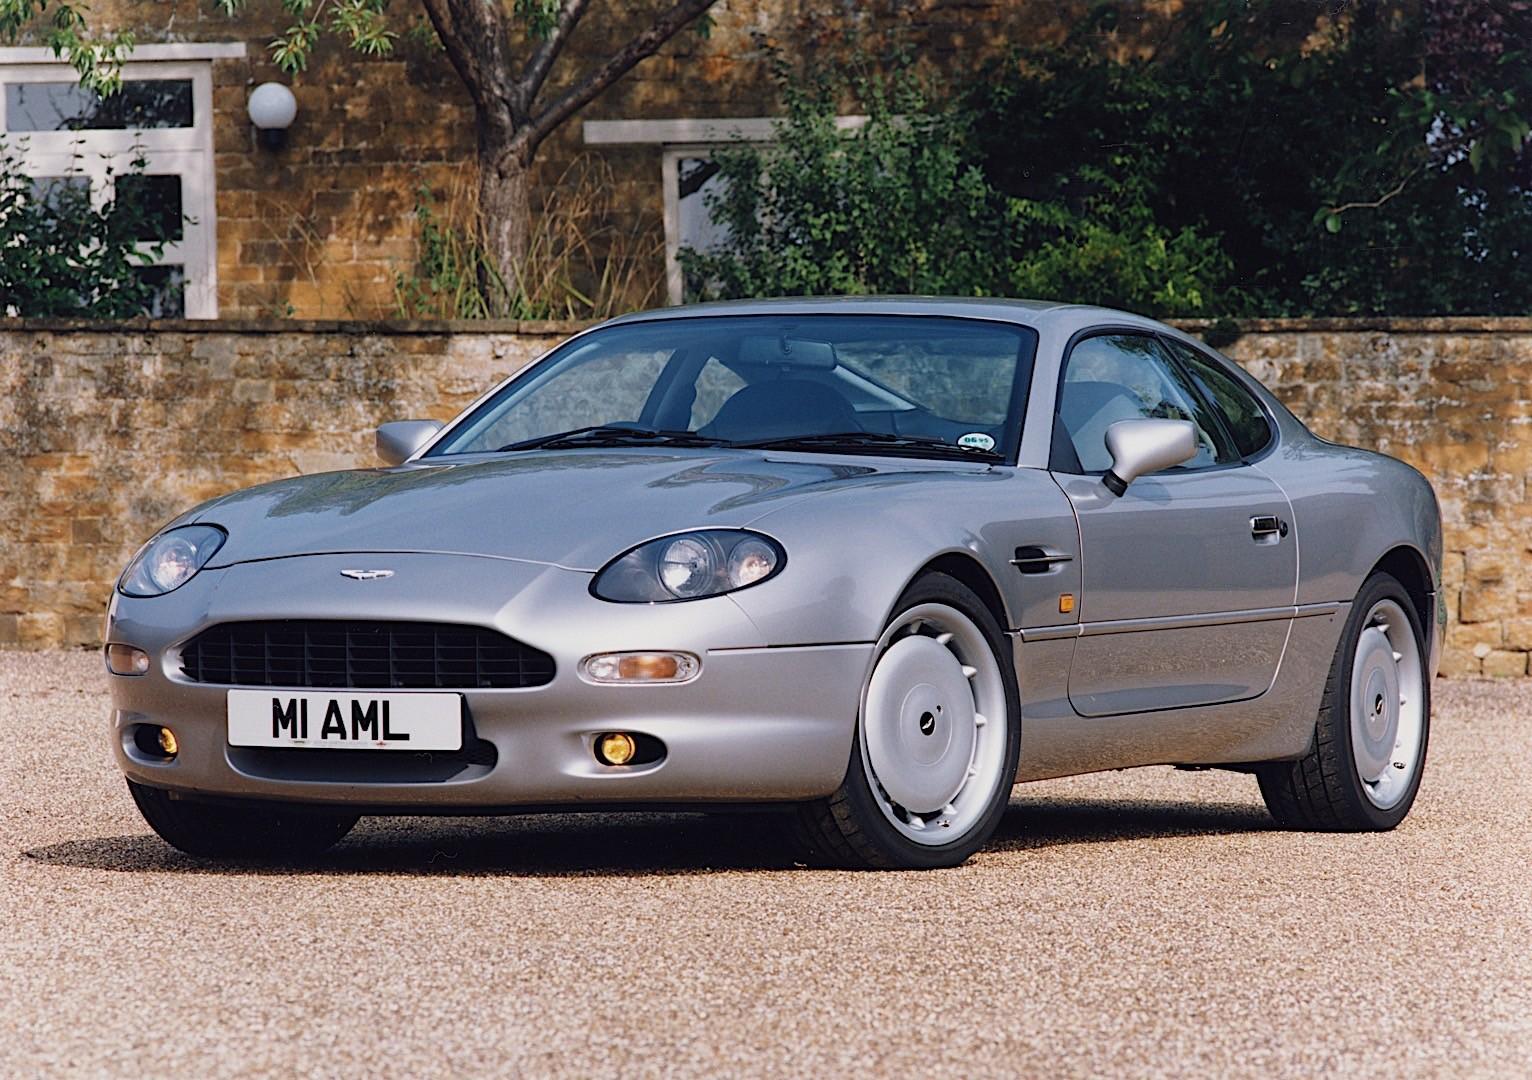 Aston Martin Db7 Coupe Specs Photos 1993 1994 1995 1996 1997 1998 1999 Autoevolution